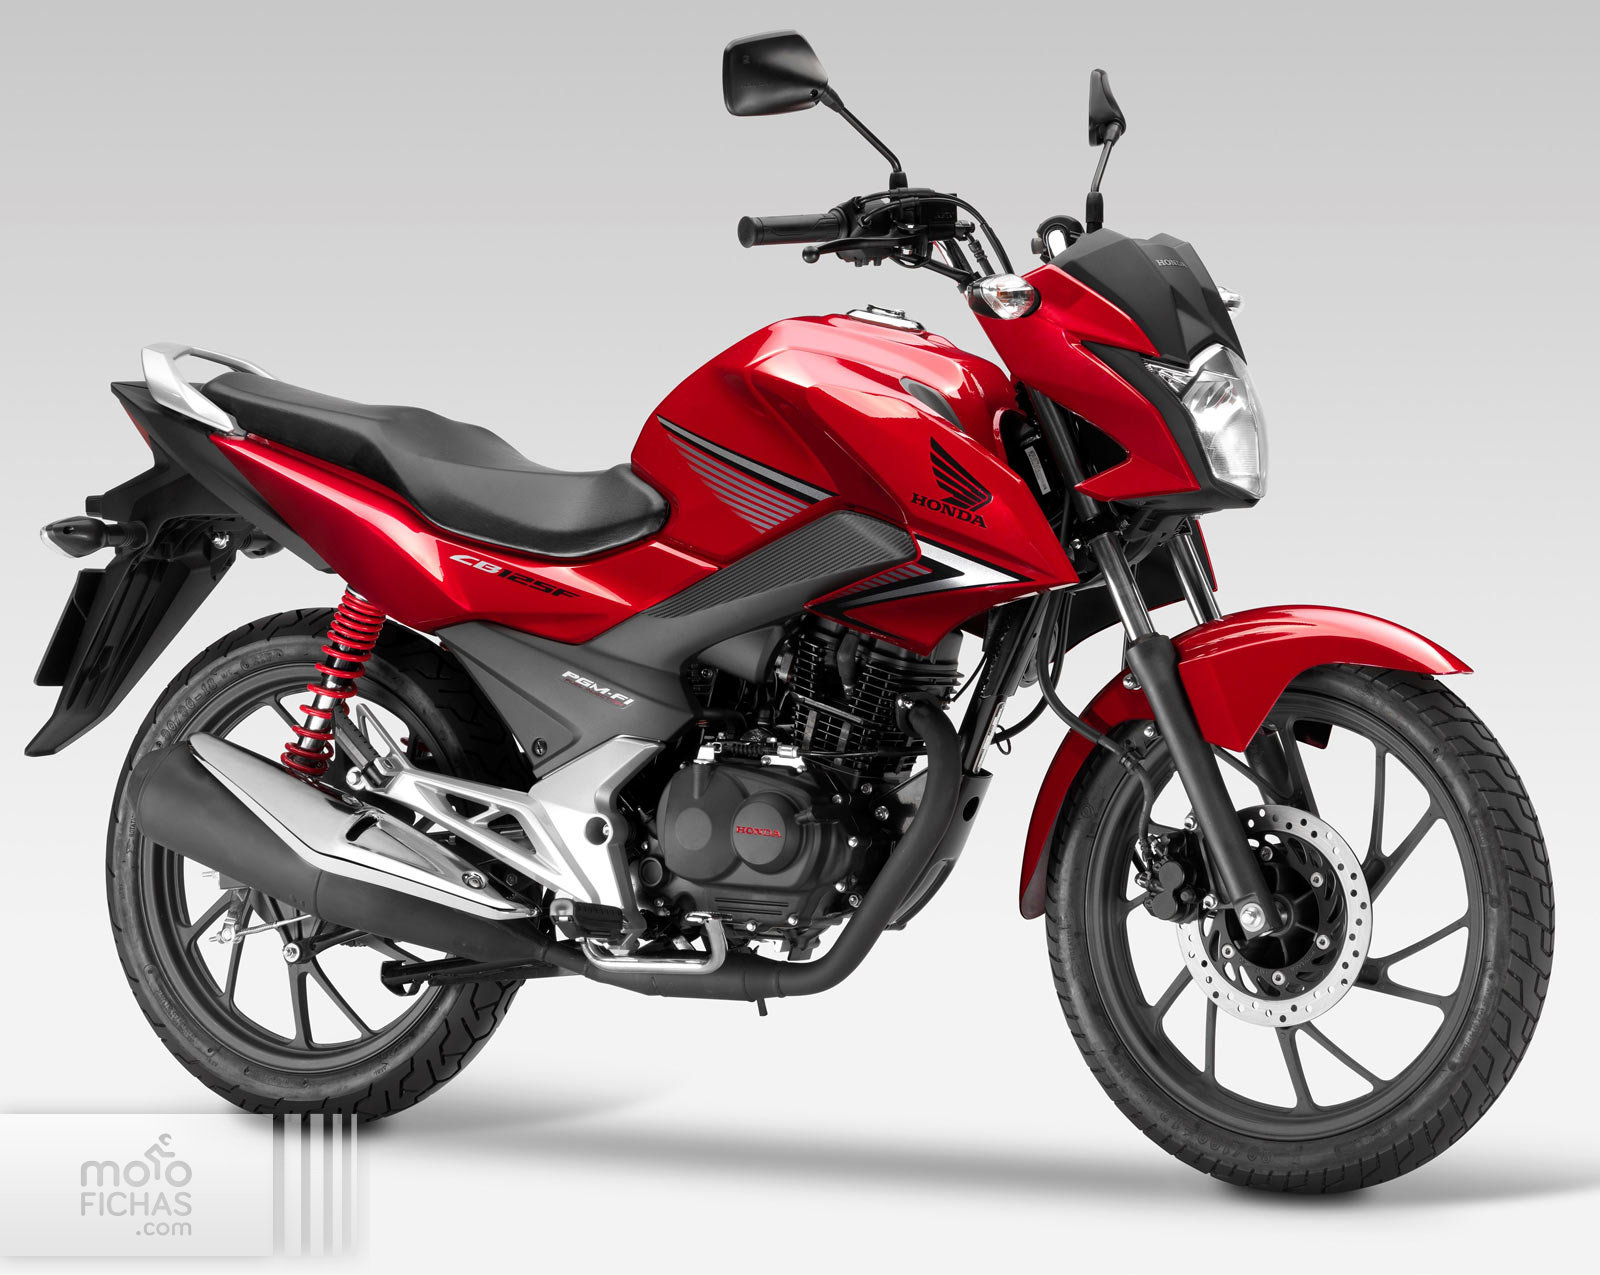 Honda twister 250 precio 0km 2020